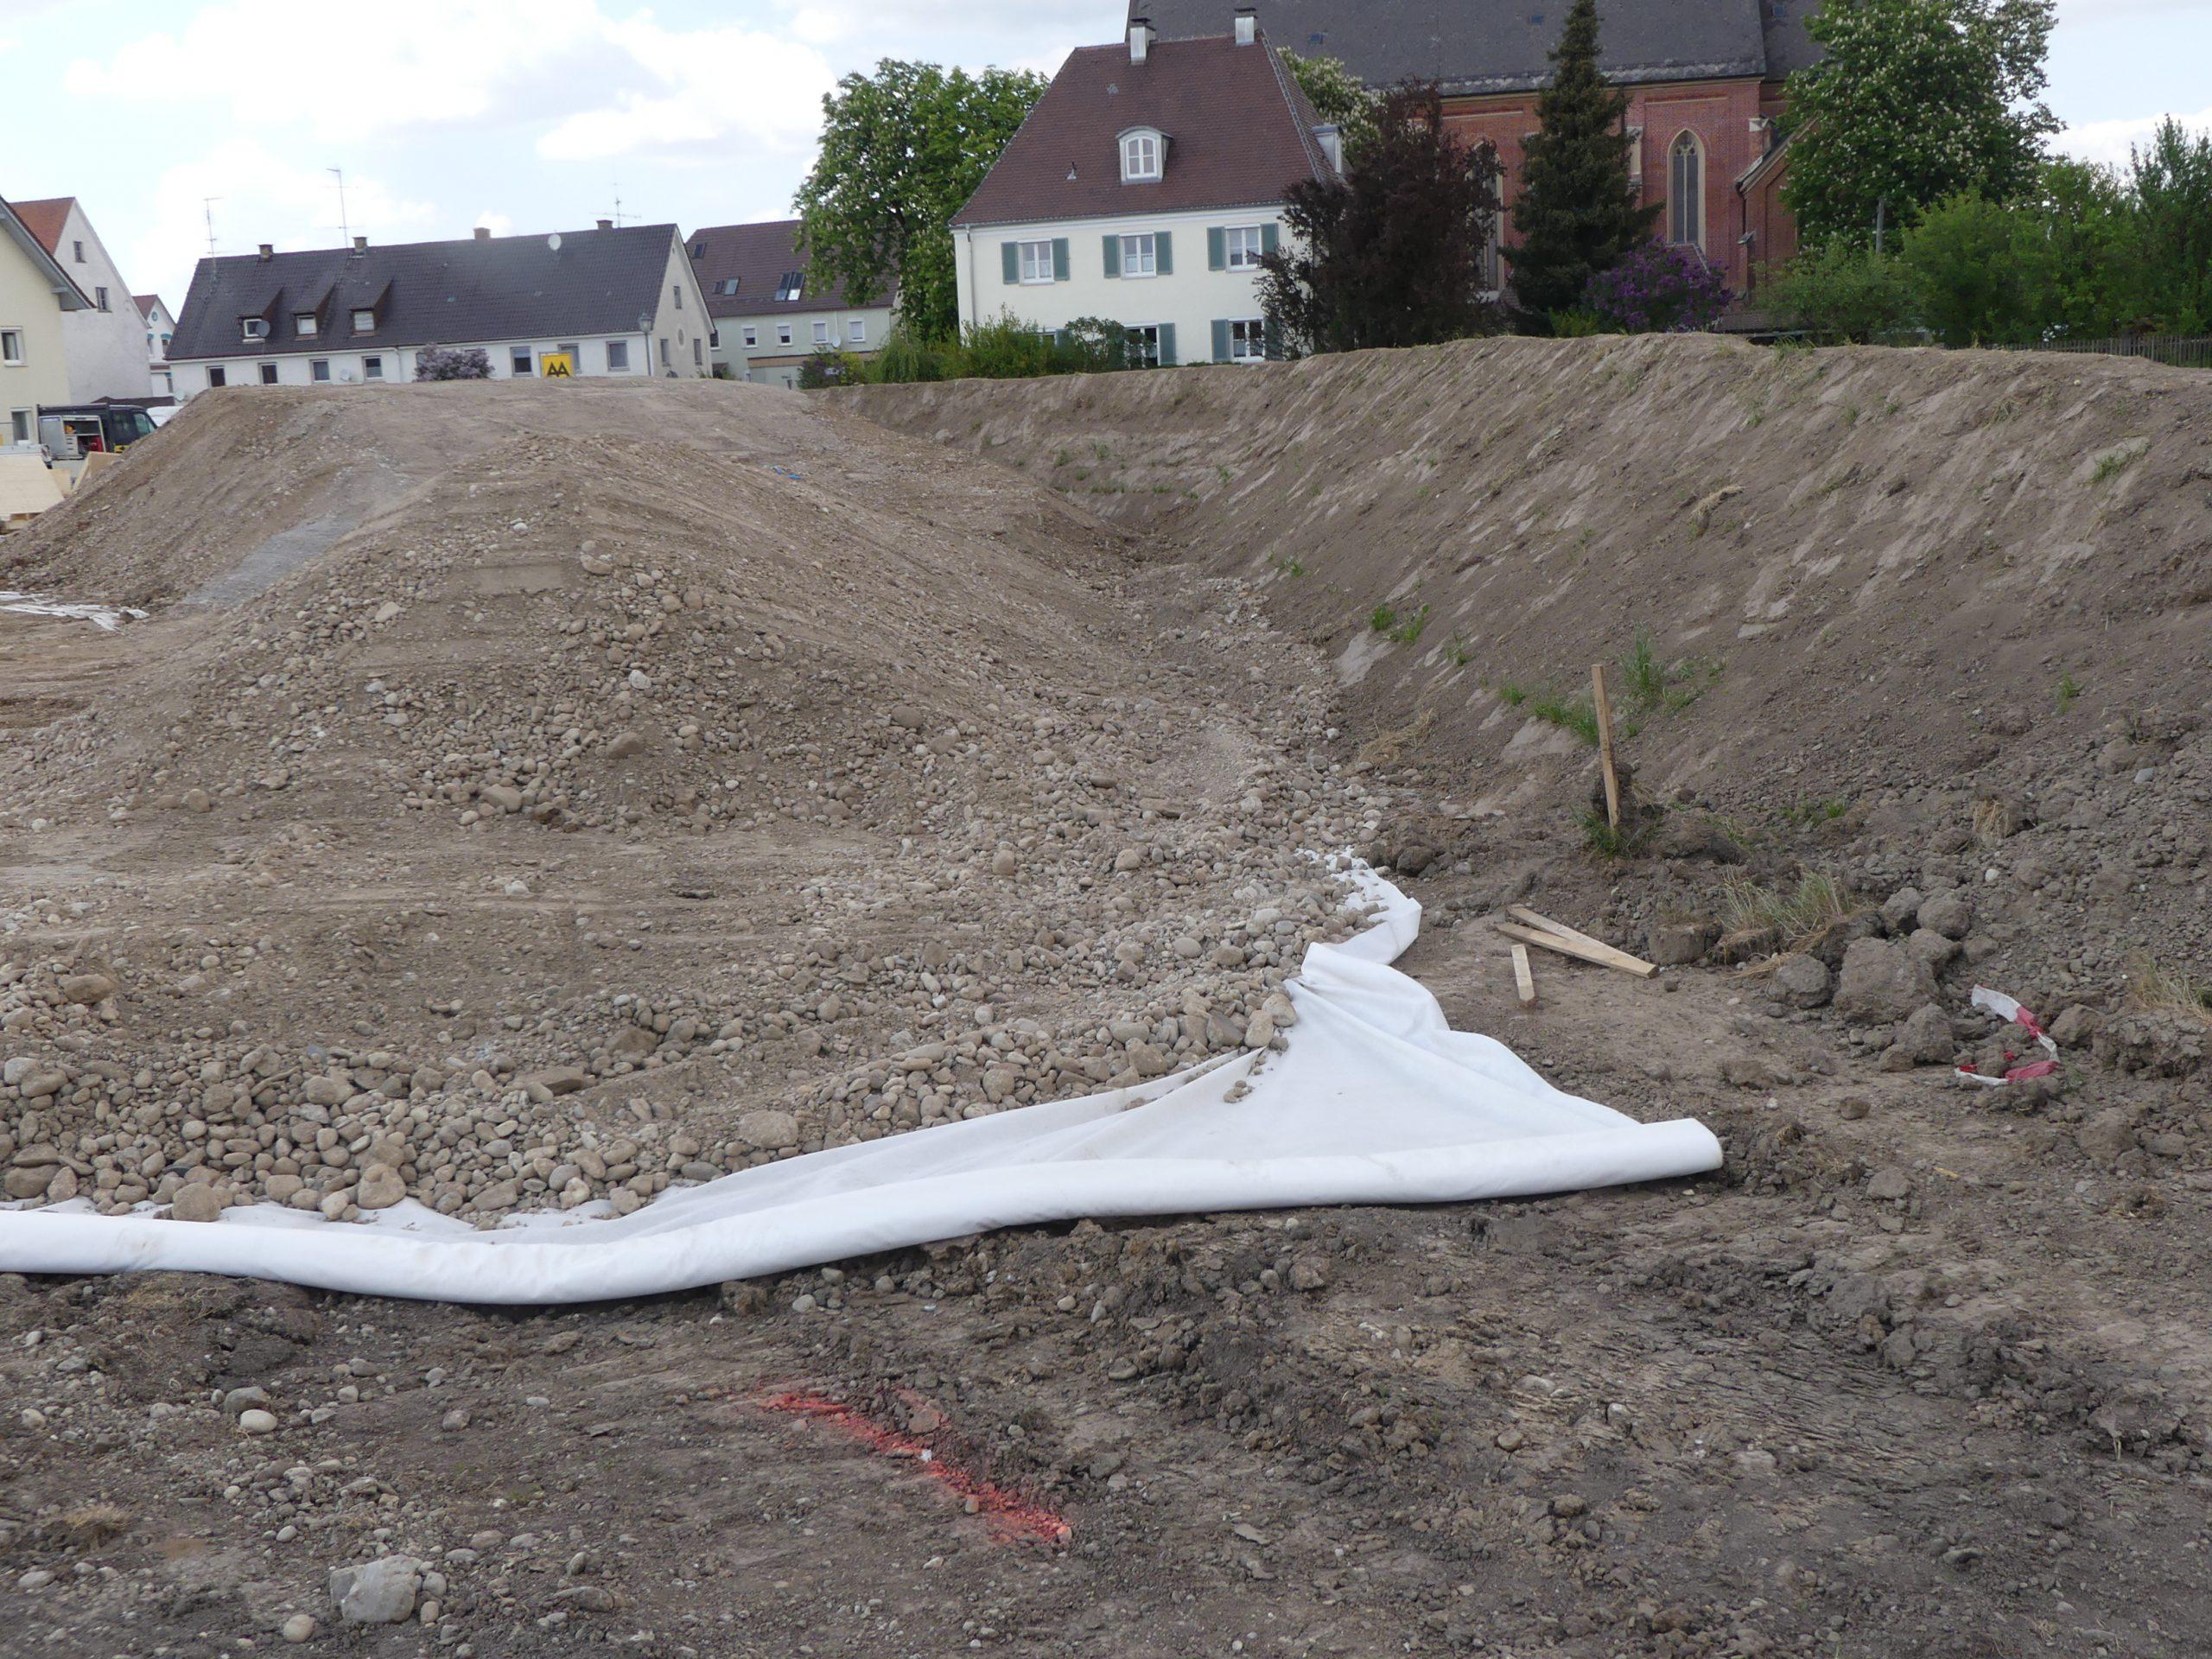 Ökologische Baubegleitung - Baustelleneinrichtungsfläche